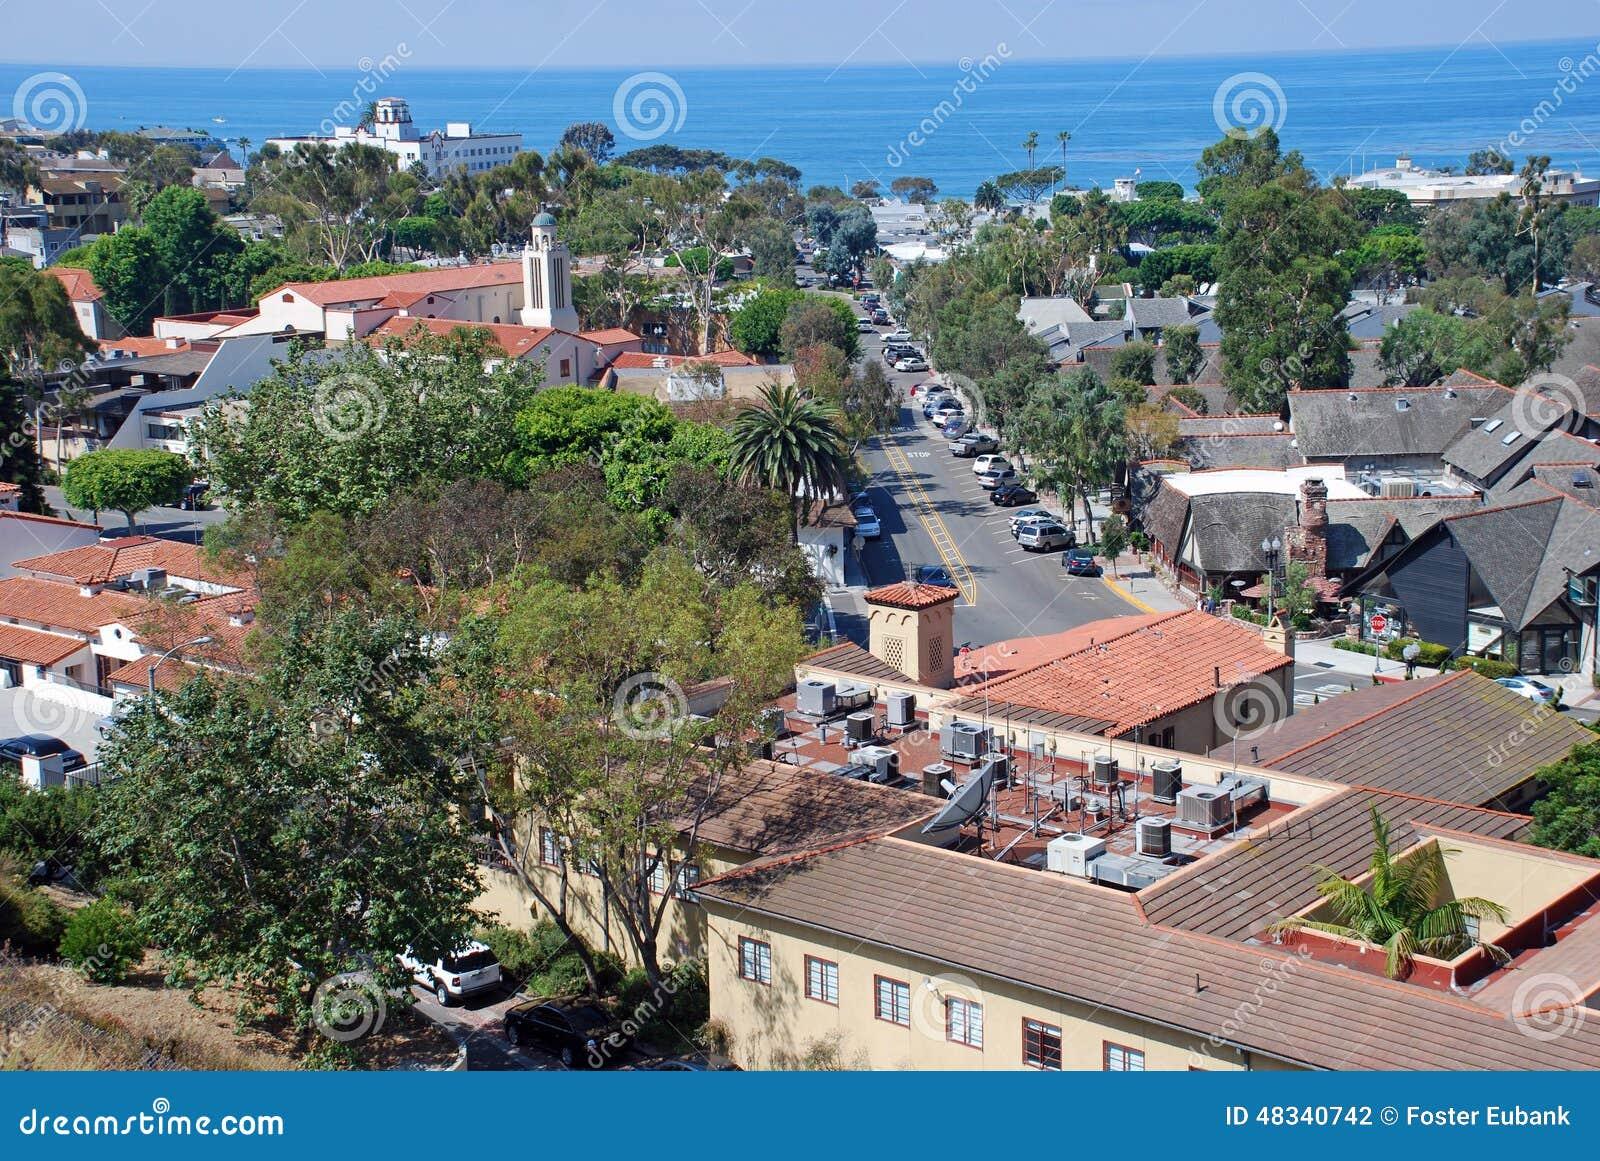 Ocean Avenue Laguna Beach